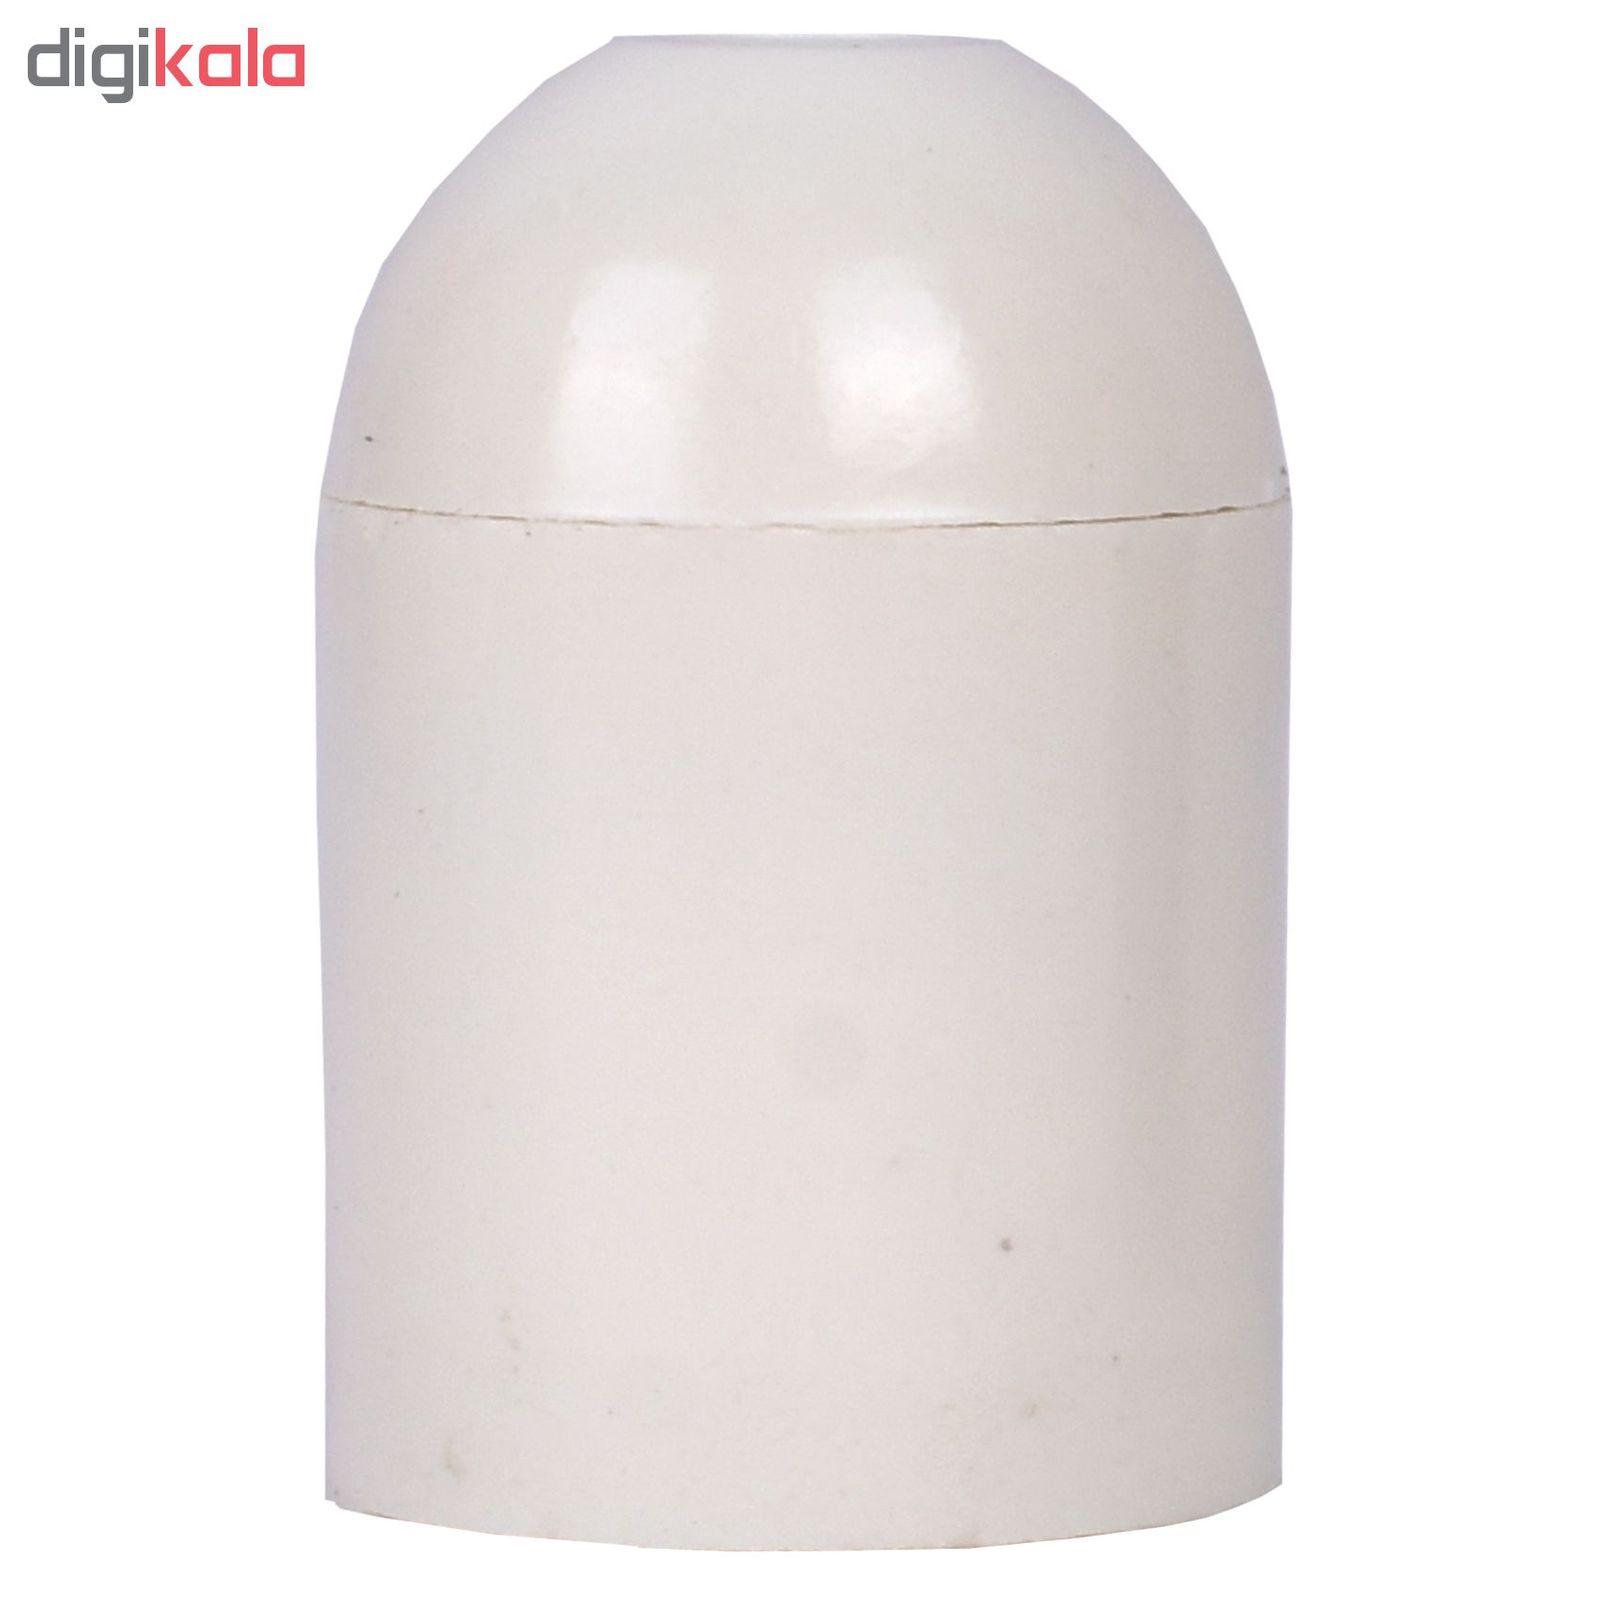 سرپیچ لامپ خیام الکتریک کد KH8042 پایه E27 بسته 2 عددی  main 1 4